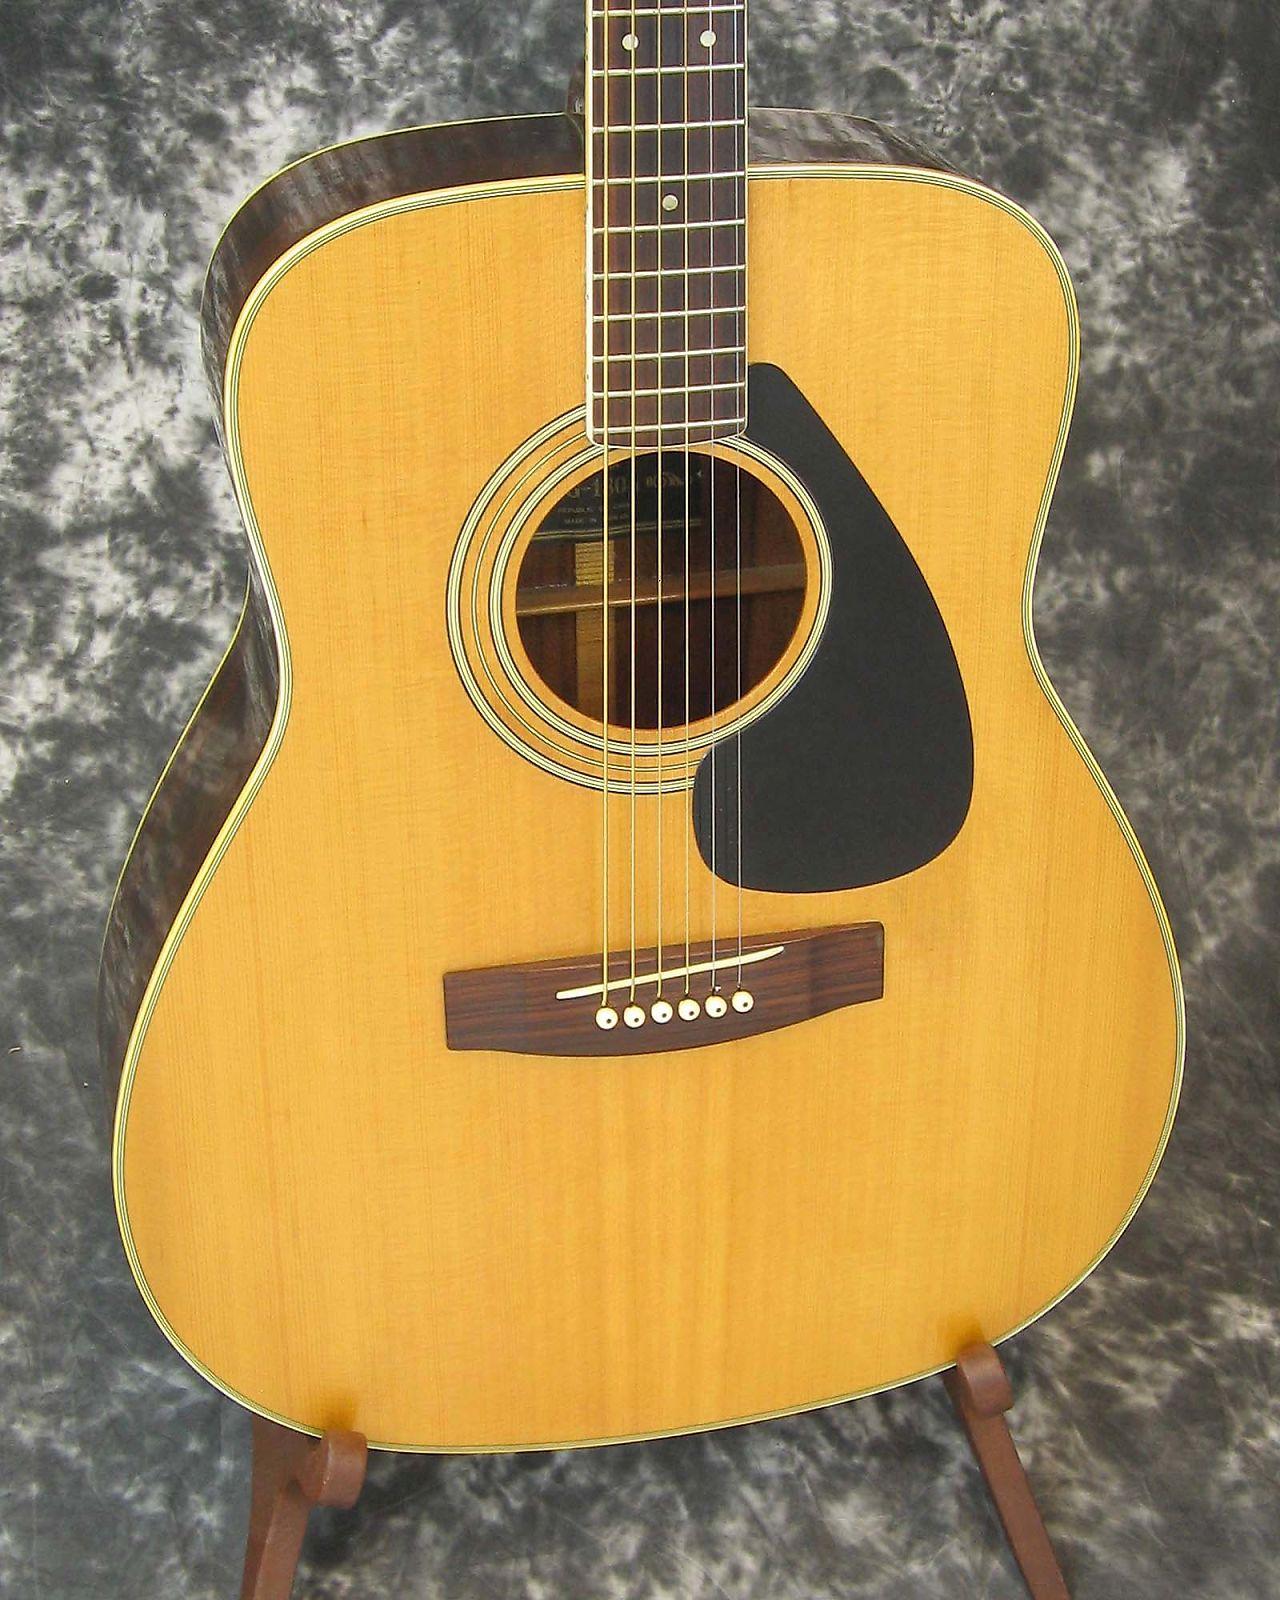 Good vintage Yamaha FG-180-1 acoustic guitar w/ chipboard case